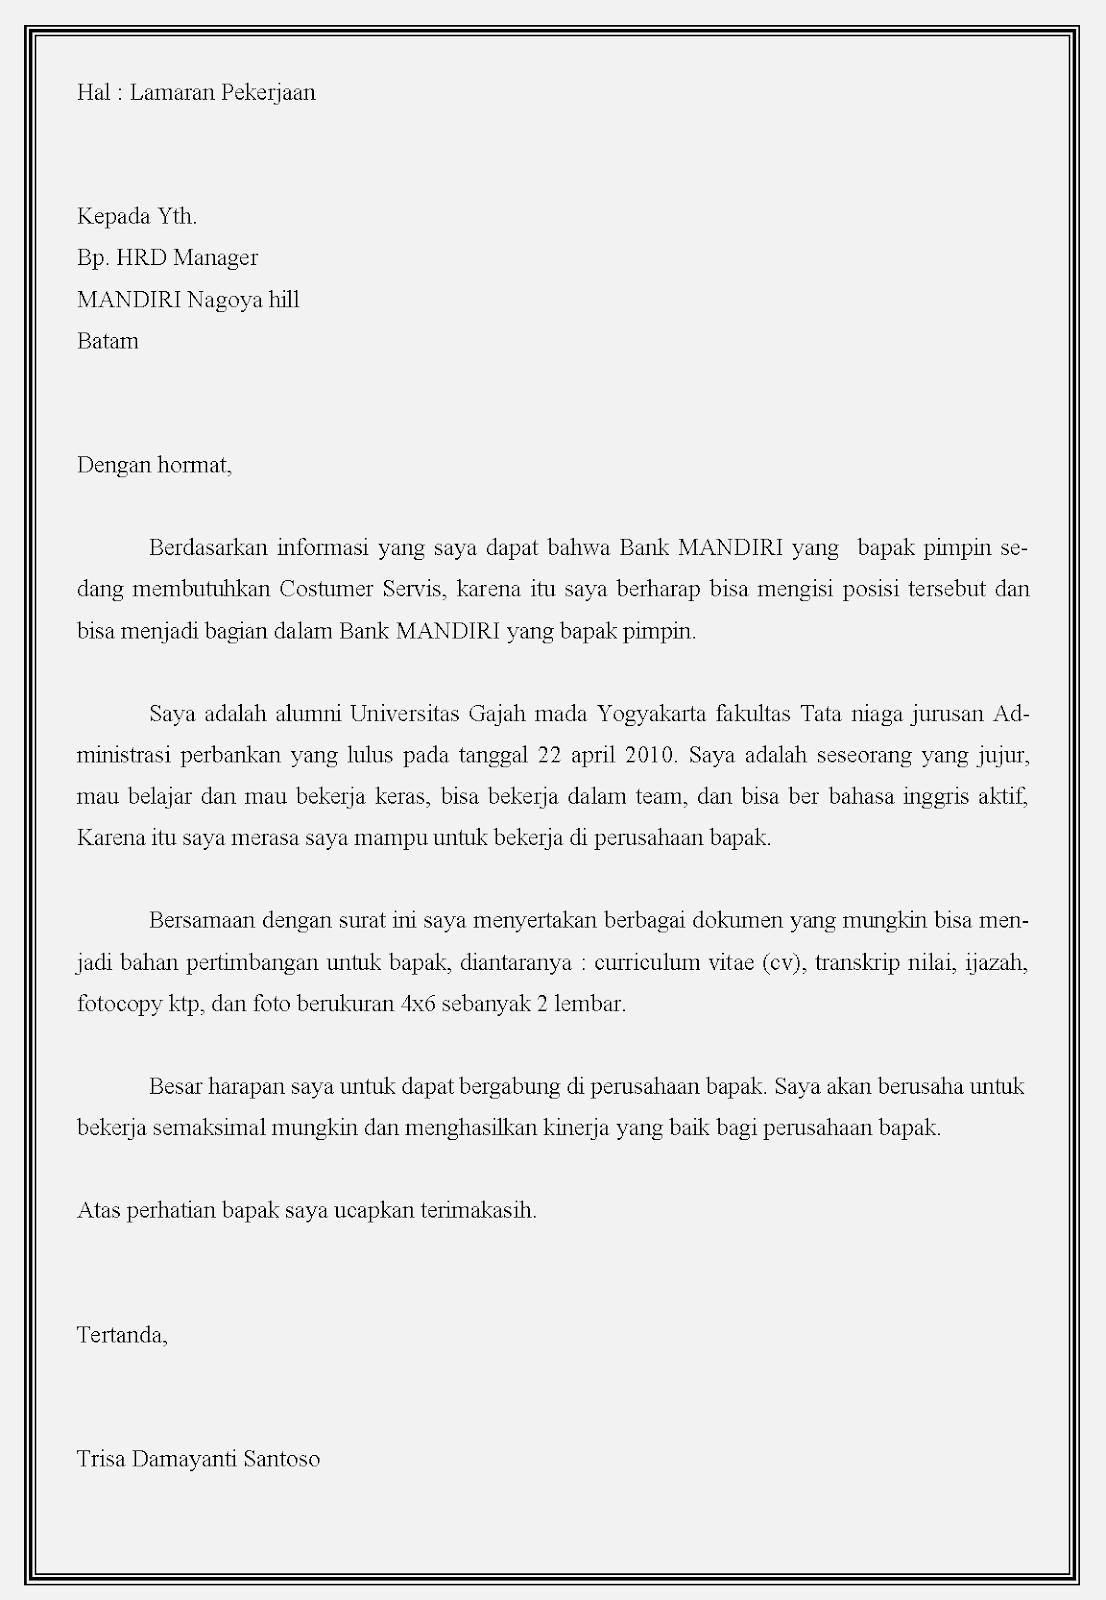 Contoh surat lamaran kerja bank Mandiri yang baik dan benar dalam bahasa Indonesia